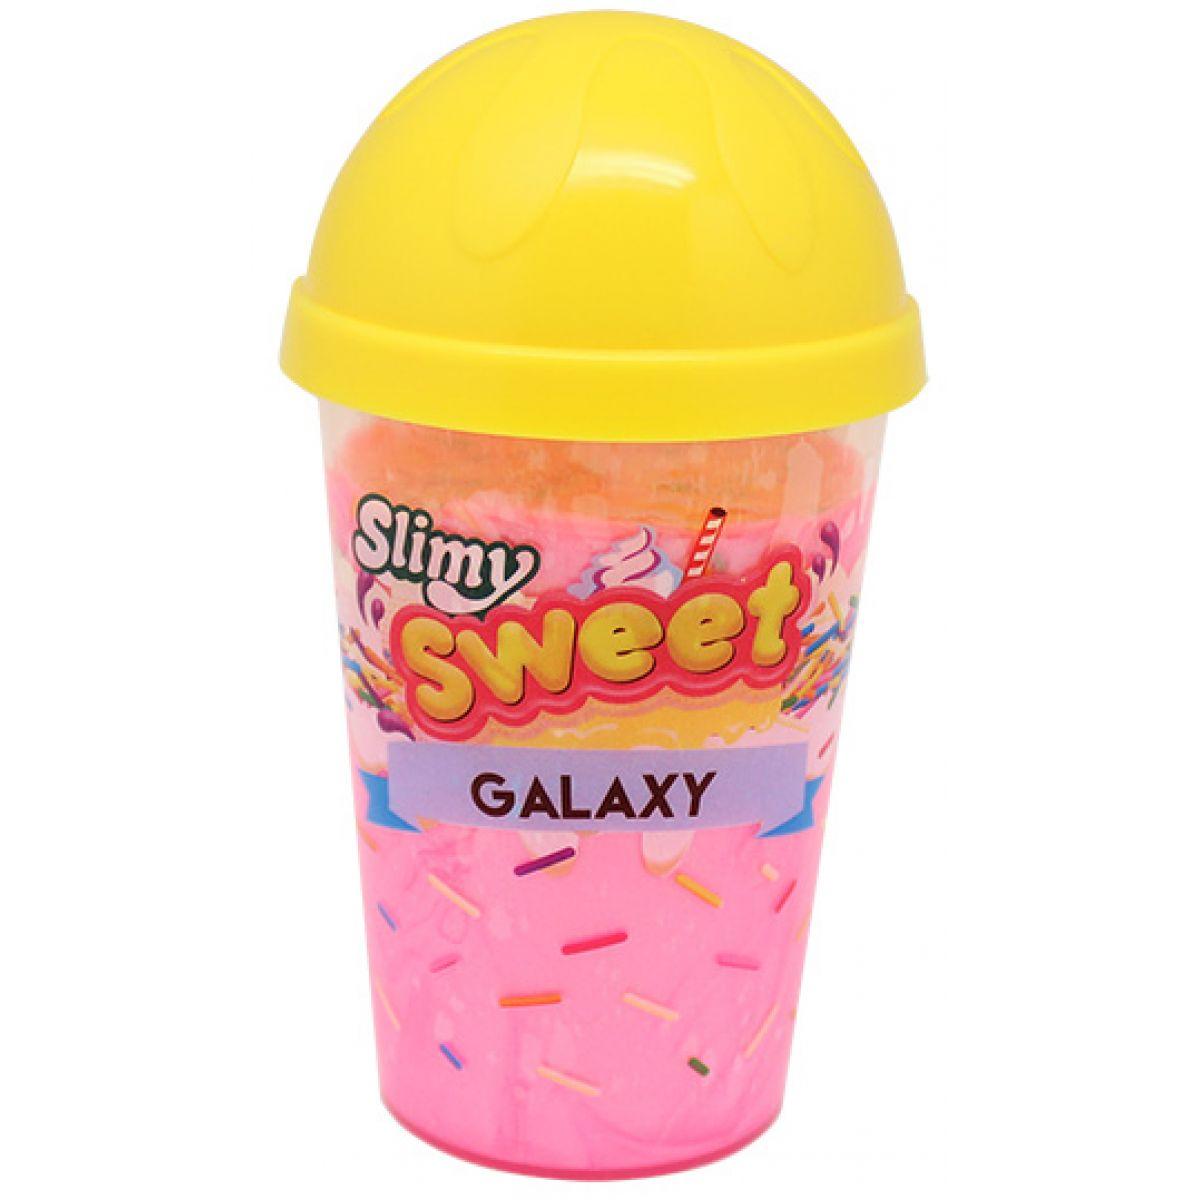 Slimy Swet Galaxy, 130 g